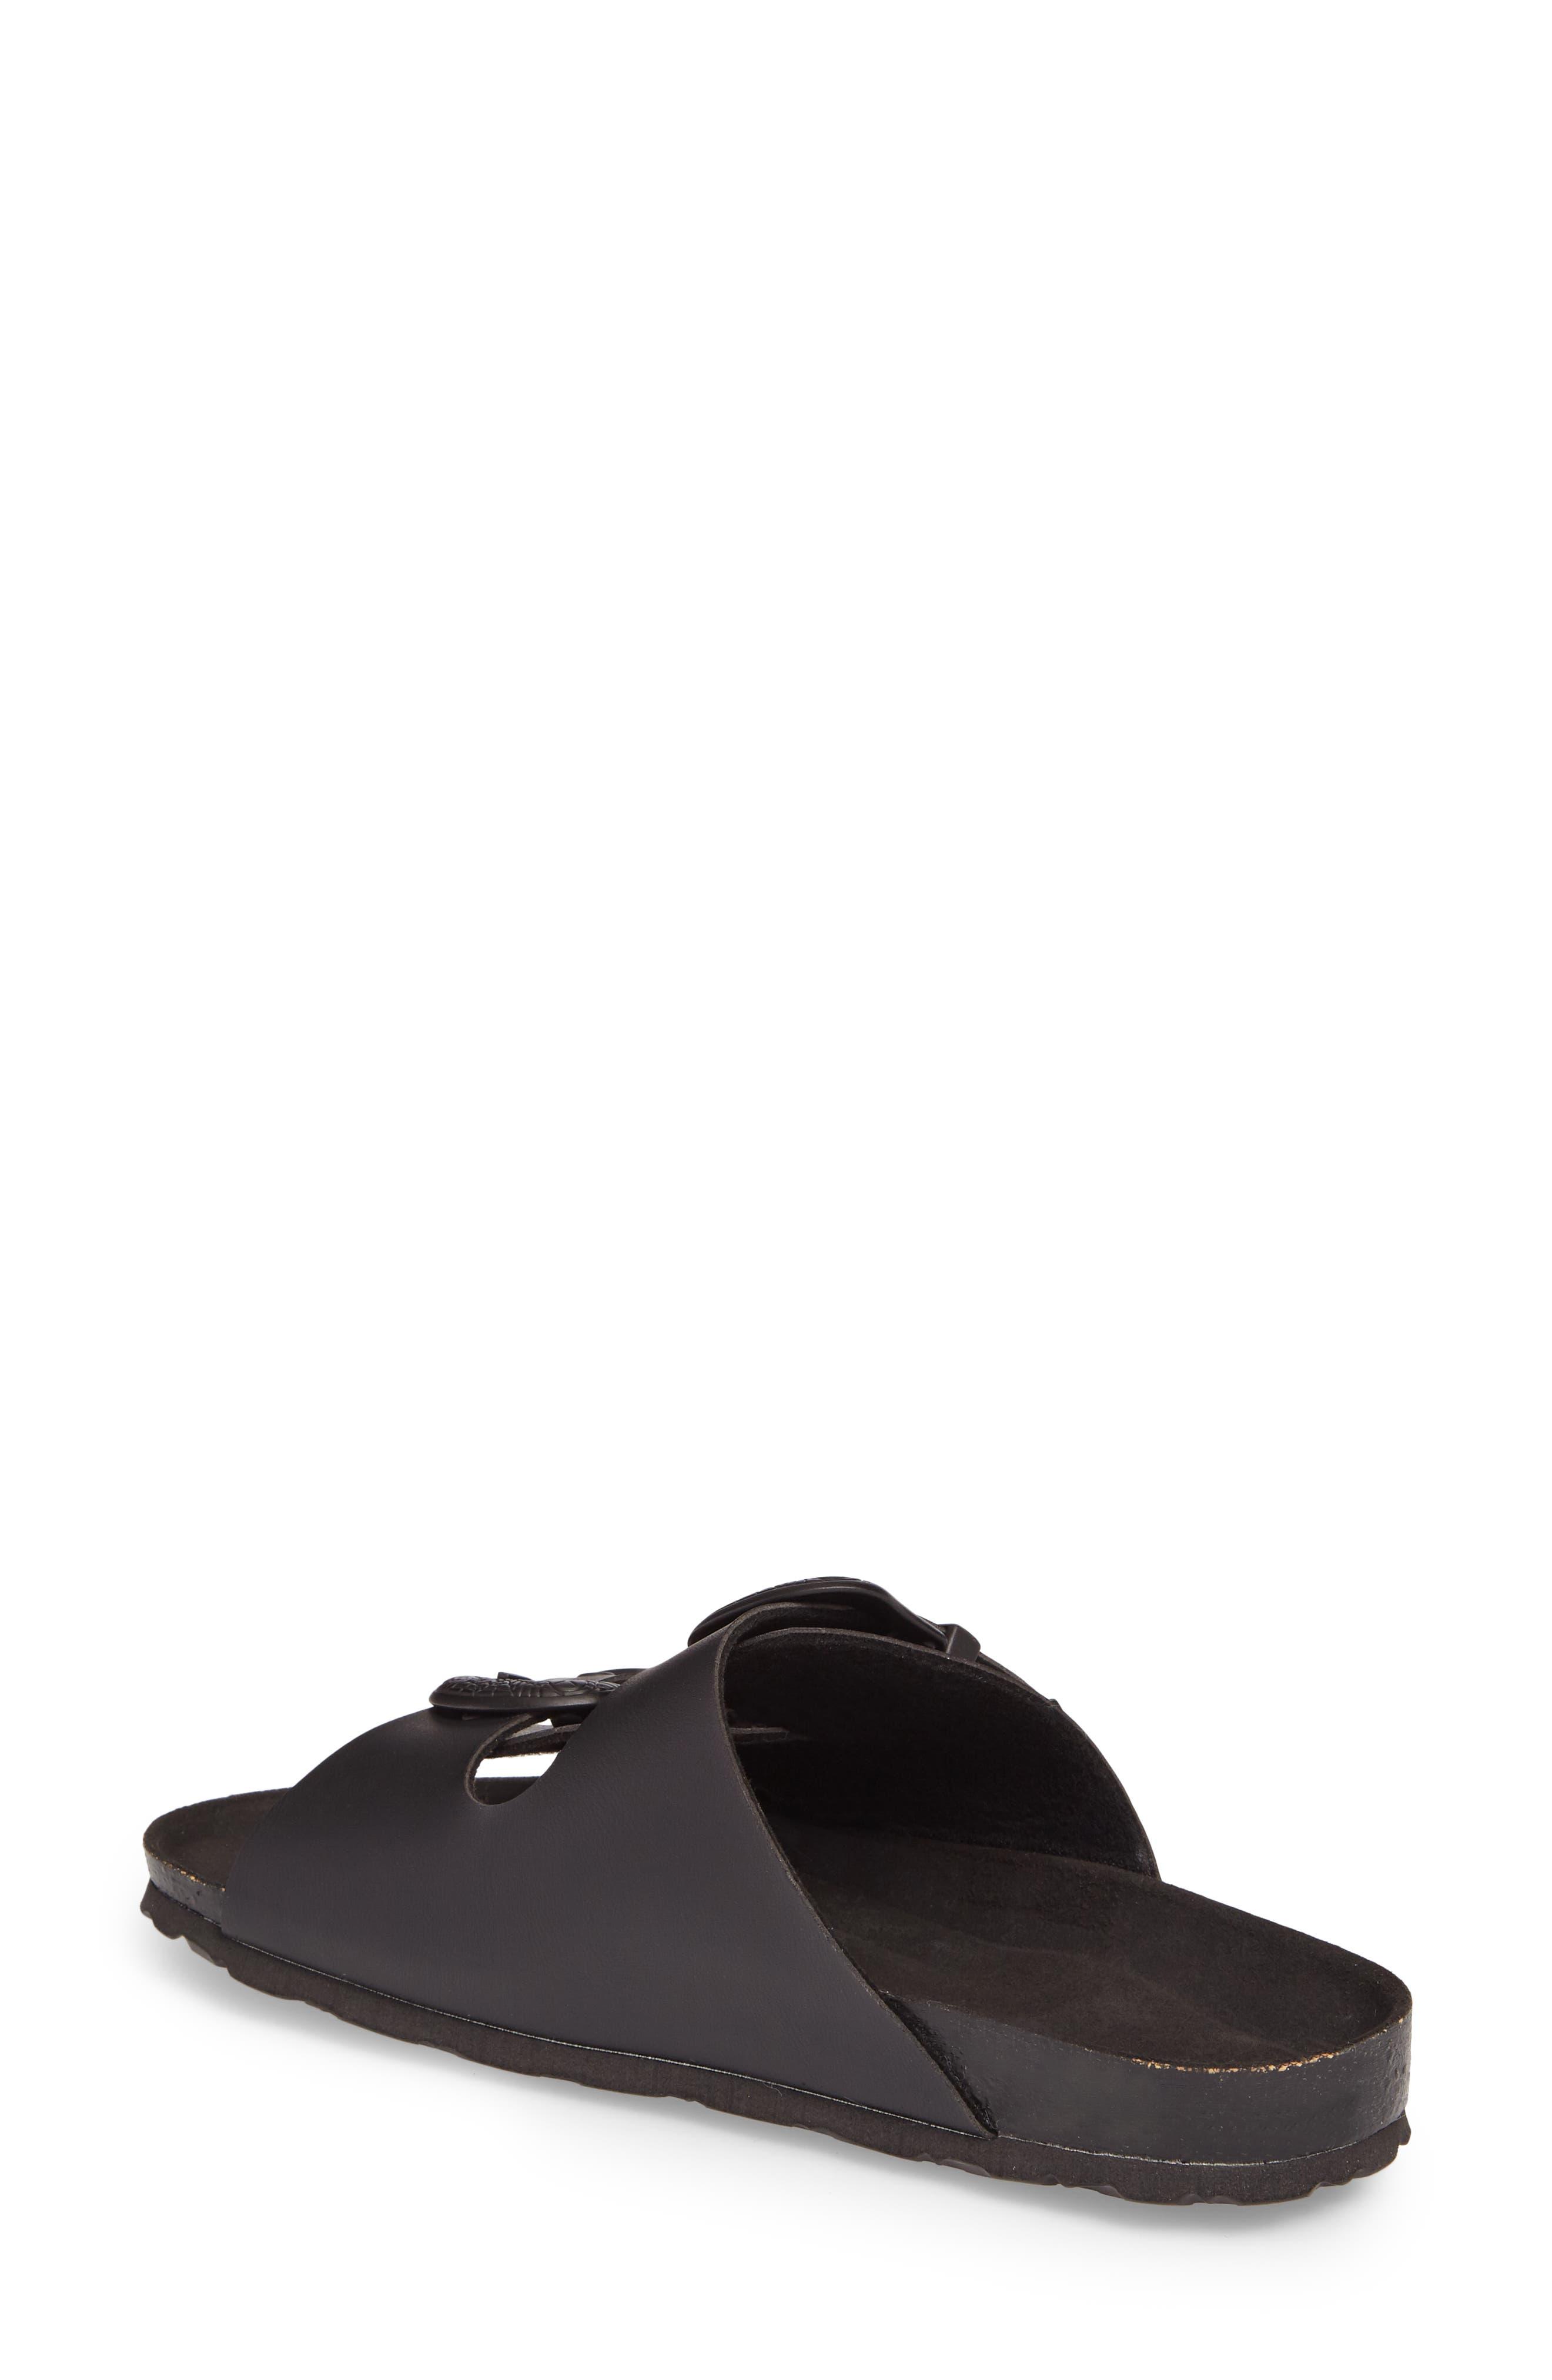 Alternate Image 2  - Topshop Studded Slide Sandal (Women)